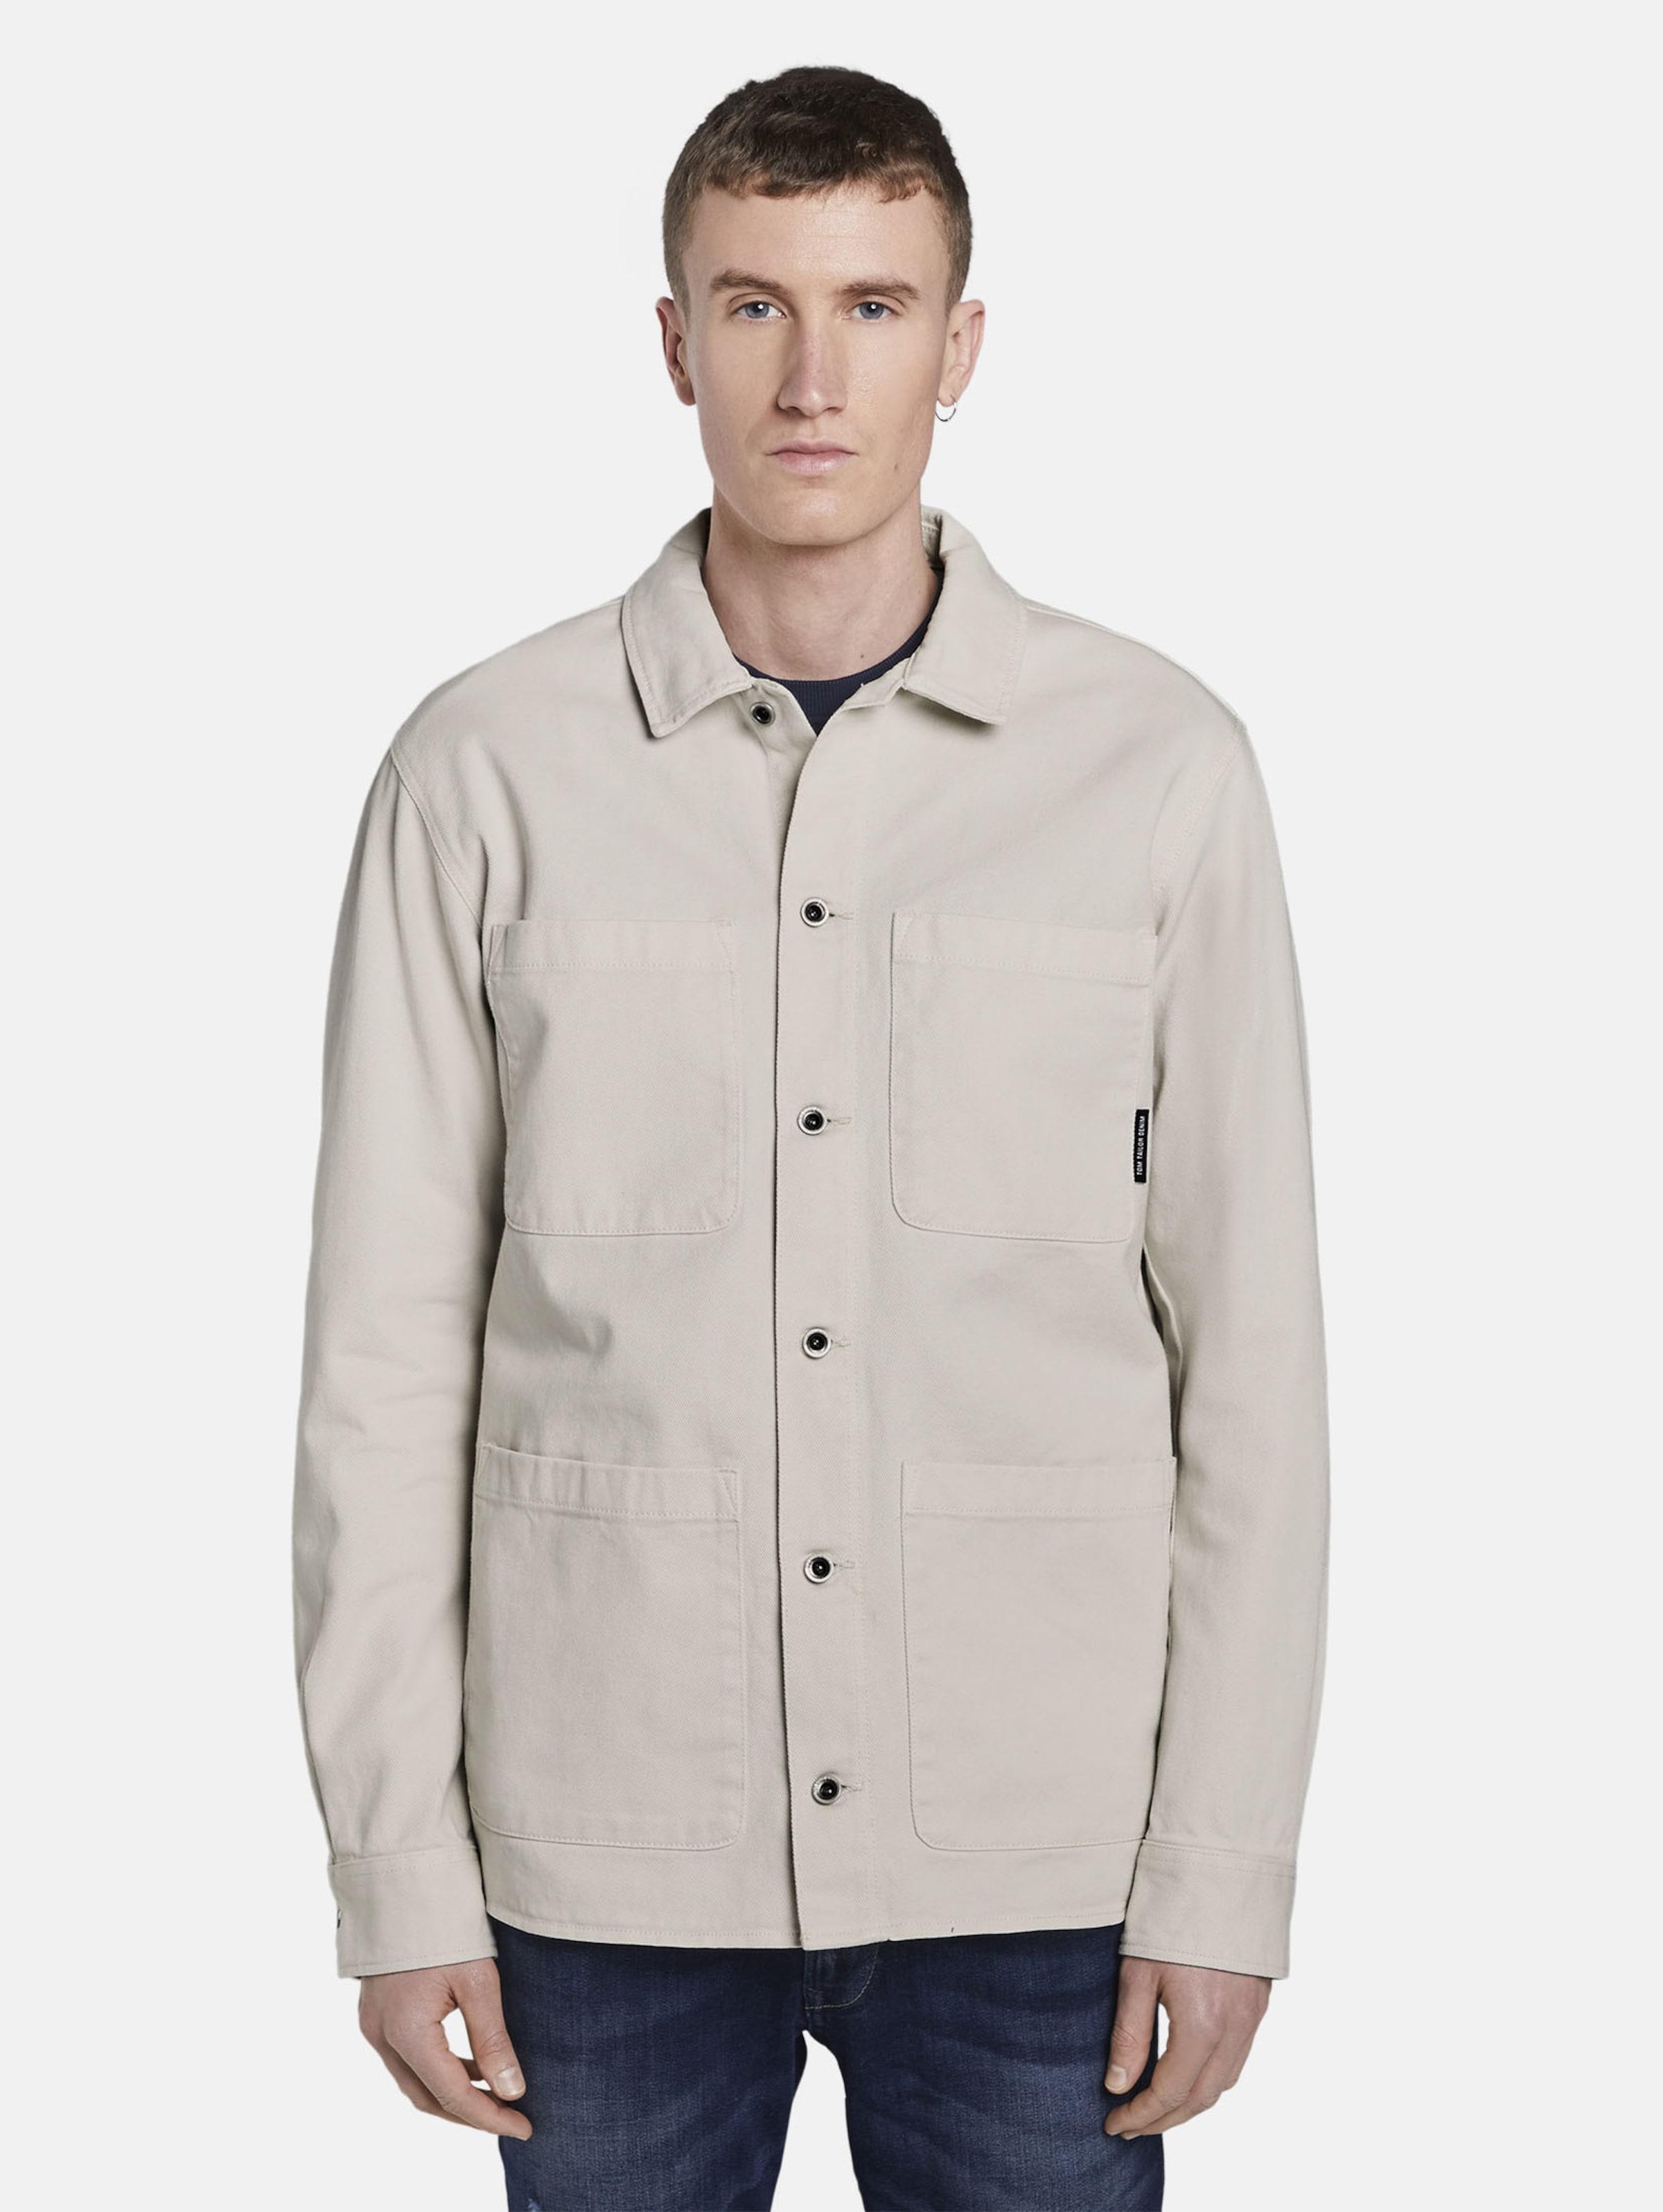 TOM TAILOR DENIM Jacke in beige / weiß Unifarben 1018176001